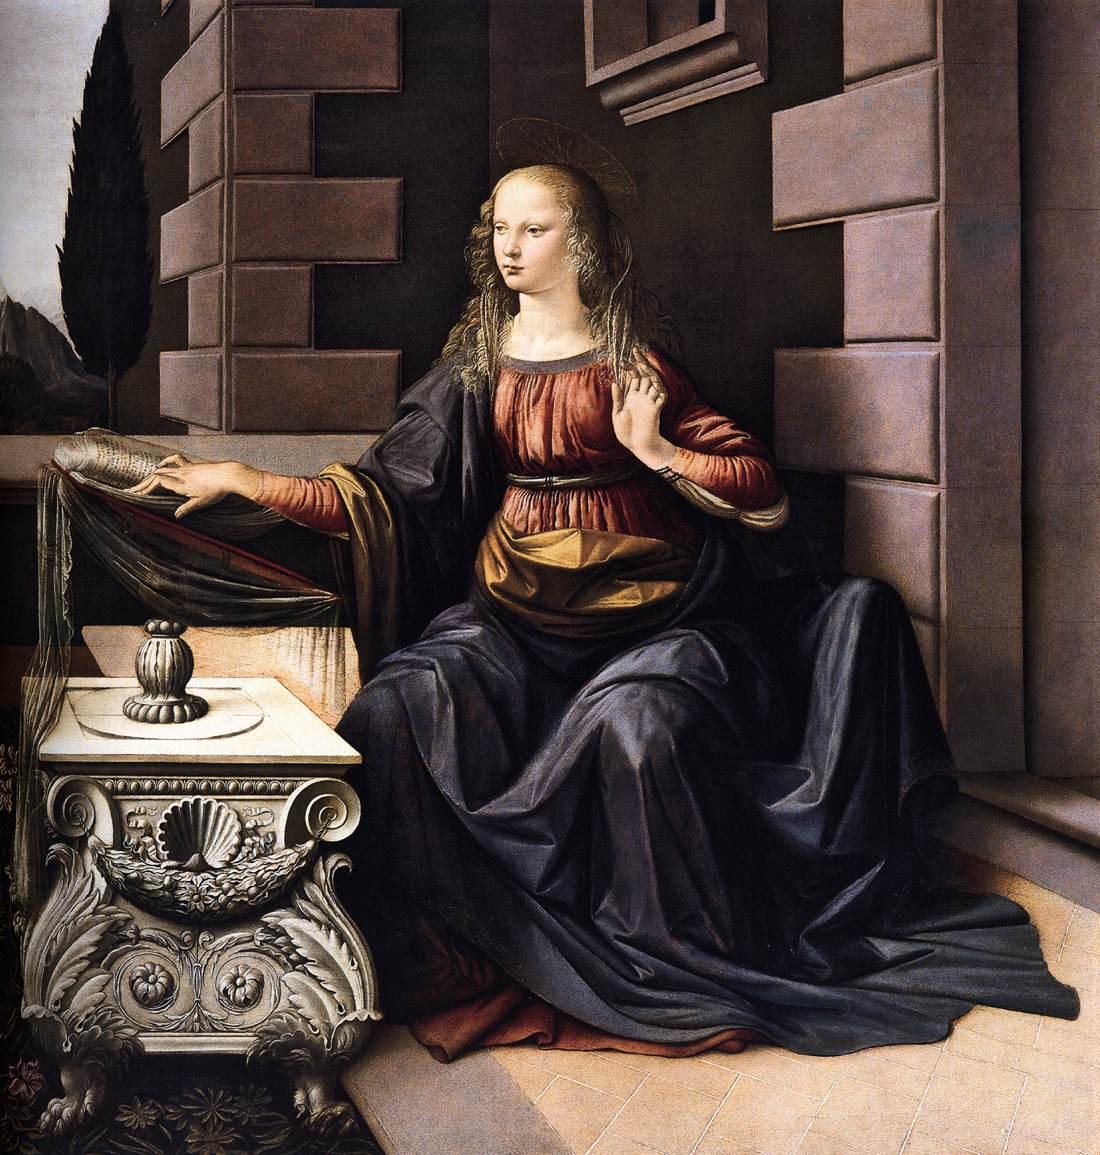 Leonardo da Vinci, De Annunciatie, Galleria degli Uffizi Firenze detail Maria